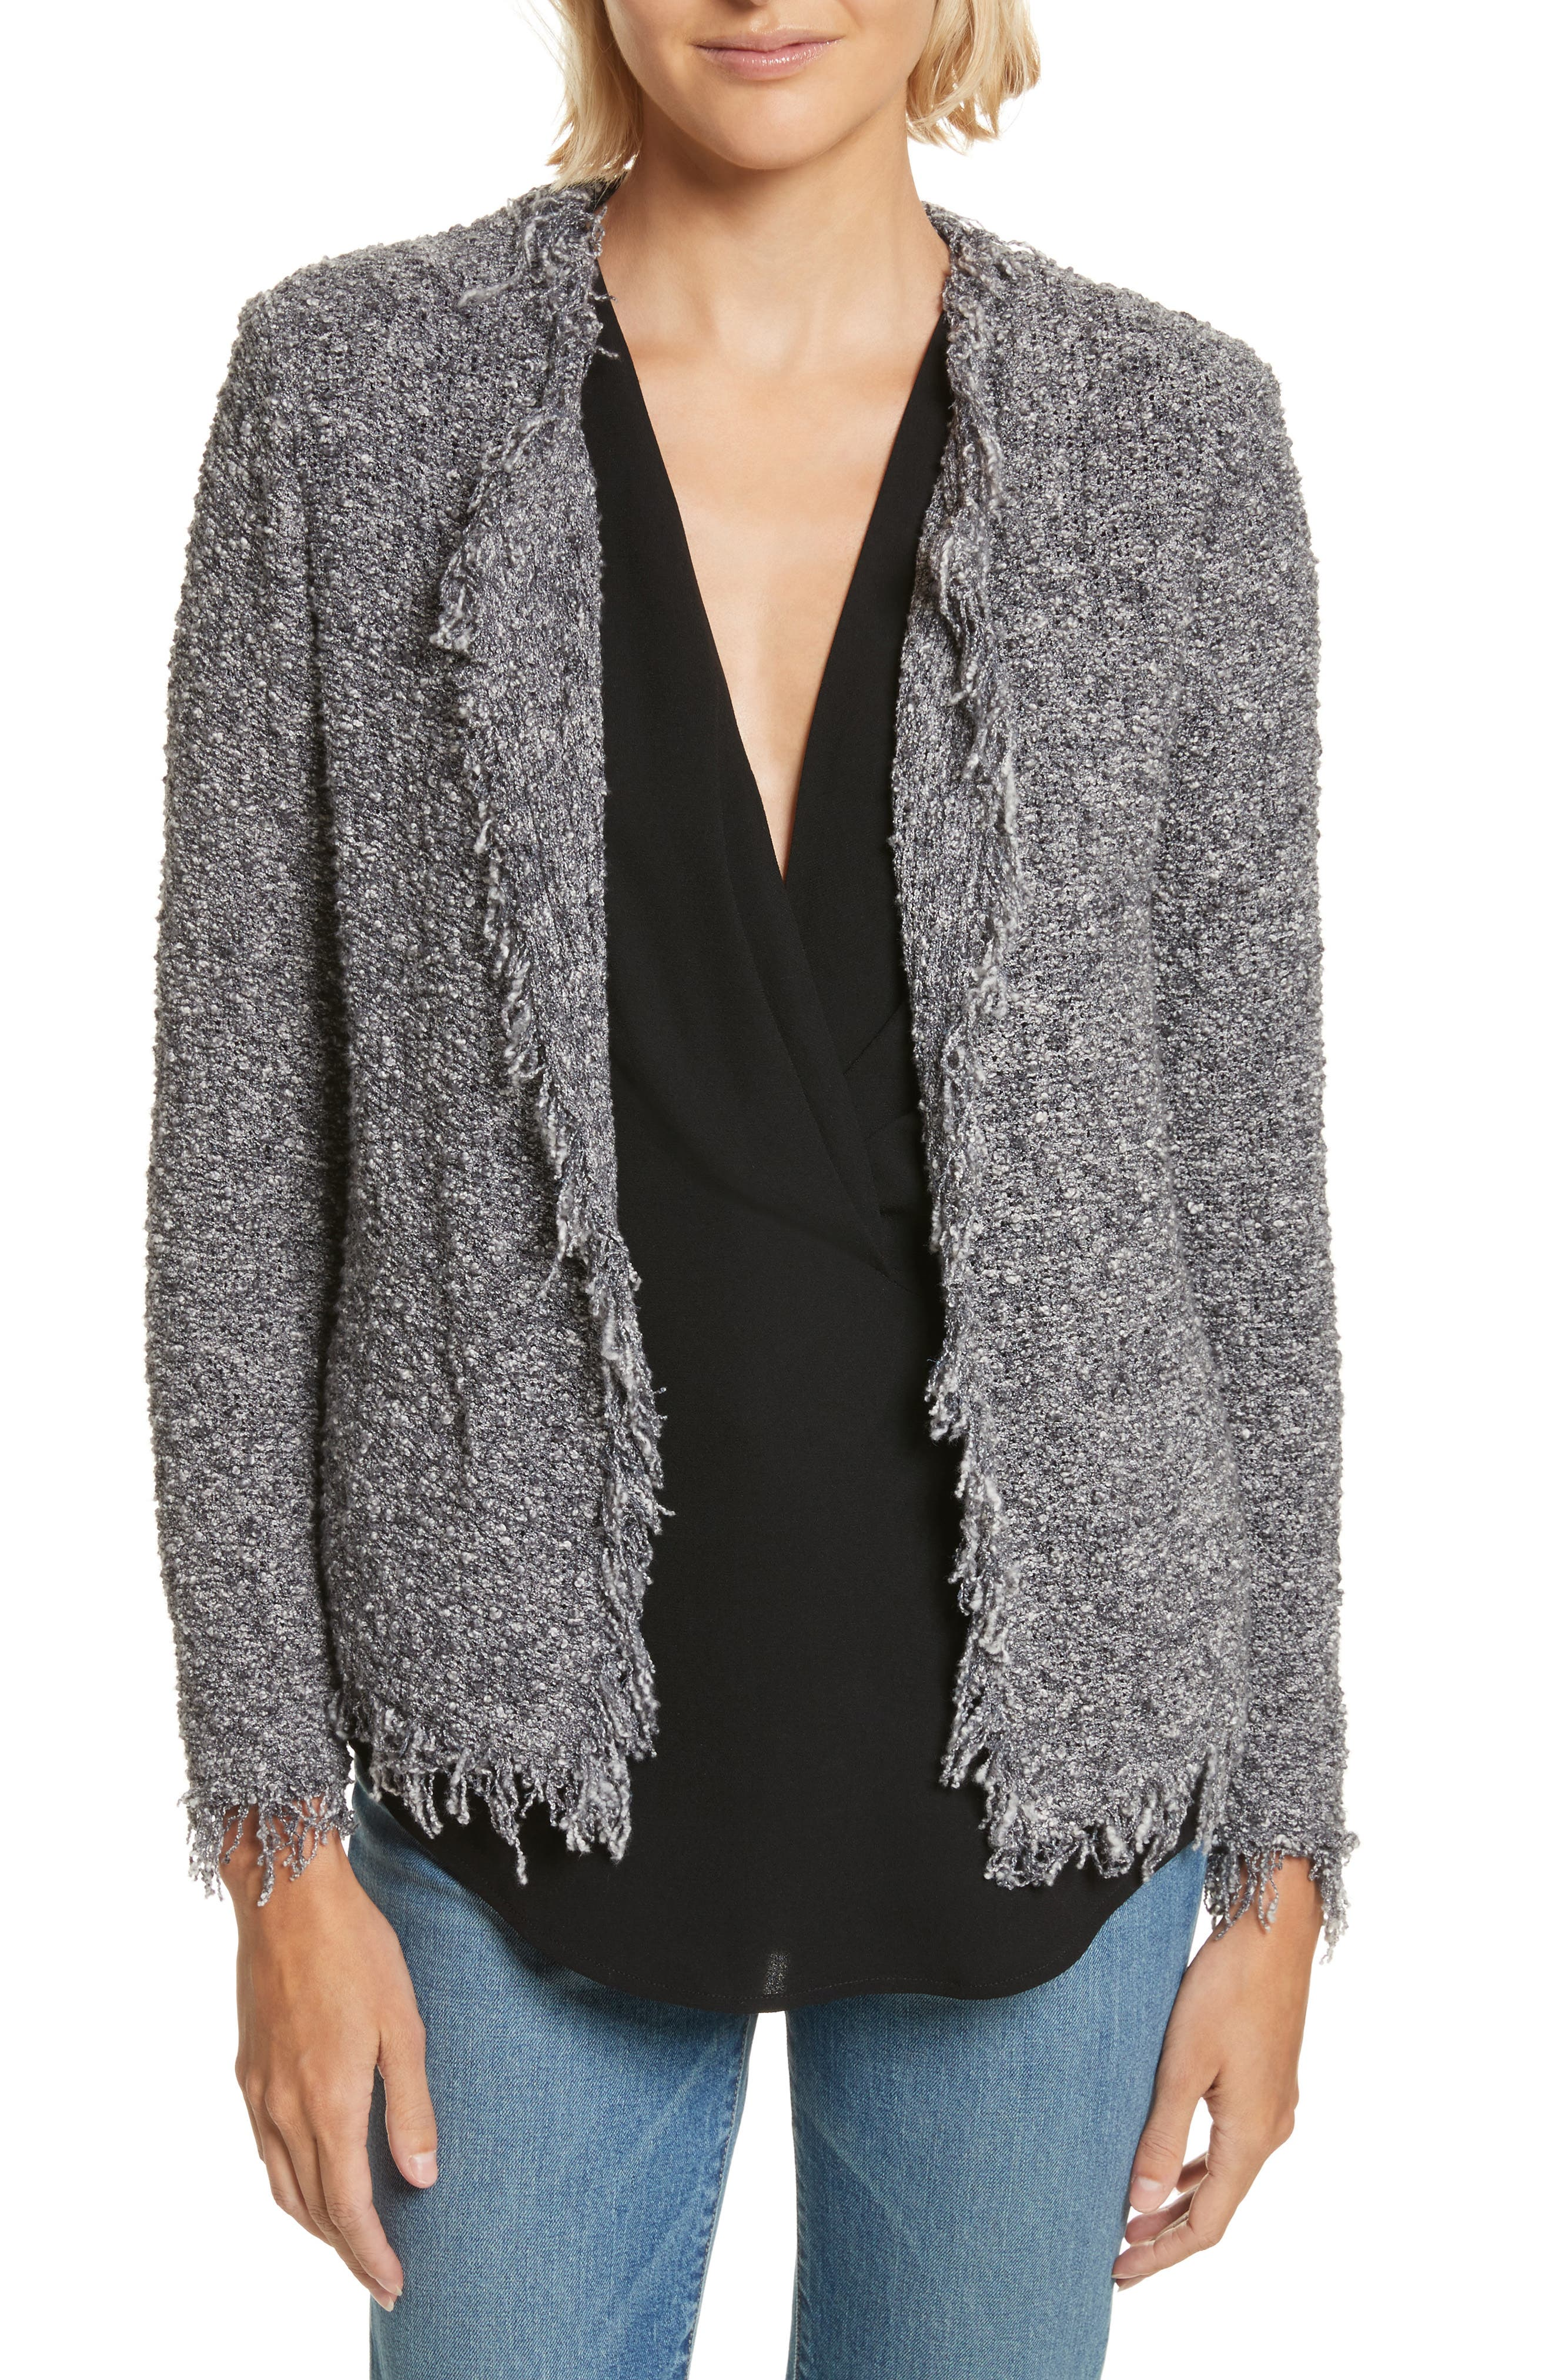 Shavanix Tweed Jacket,                             Main thumbnail 1, color,                             Dark Grey